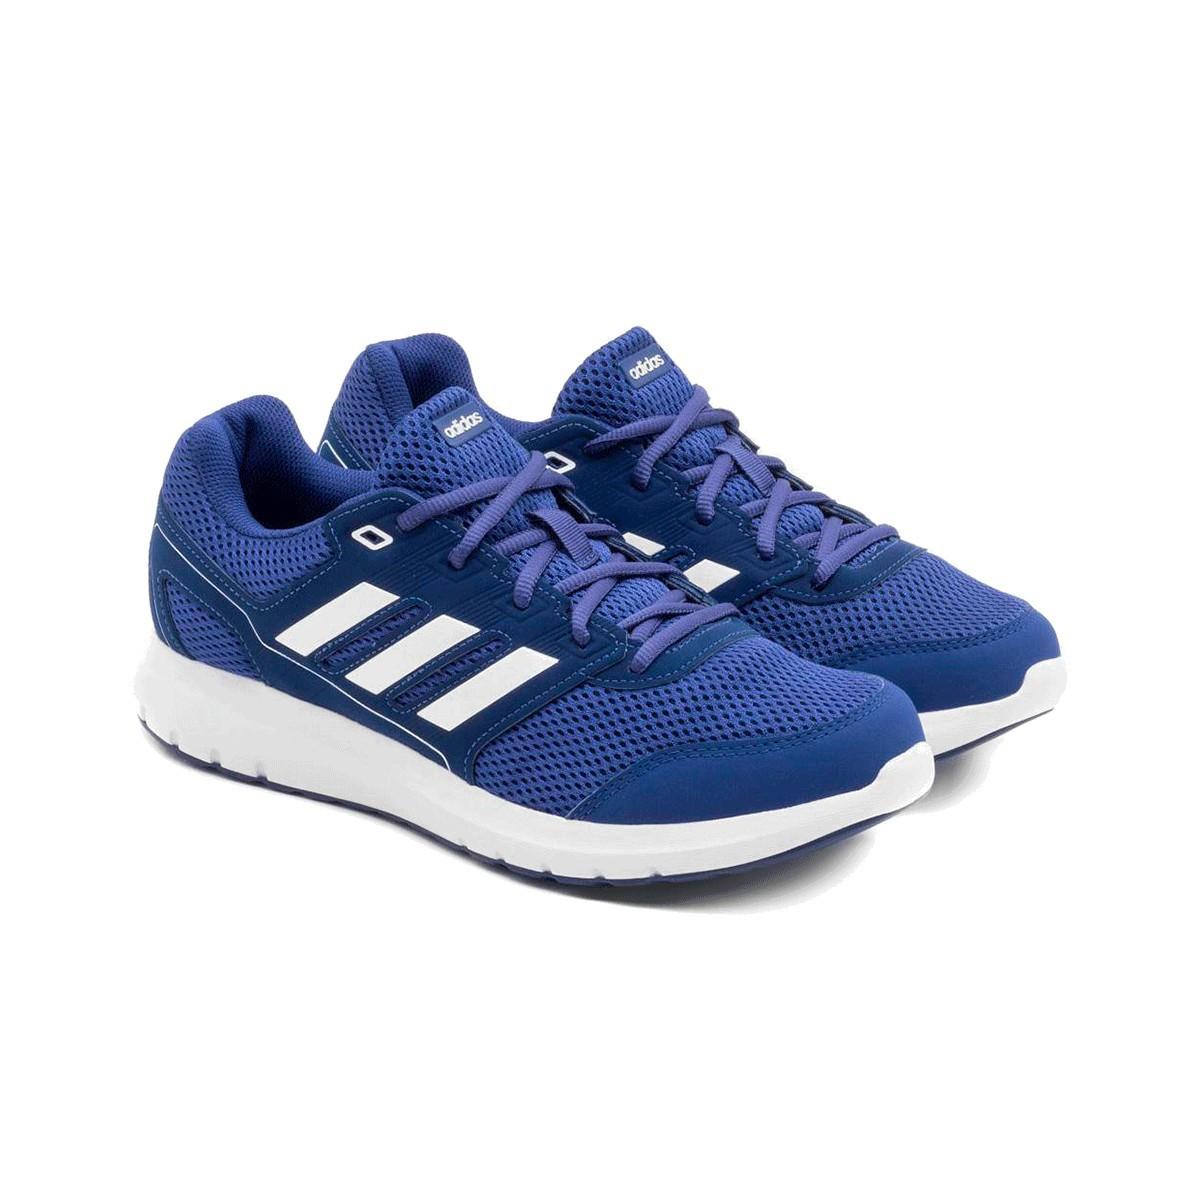 Tenis Adidas Duramo Lite 2.0 Masculino Azul